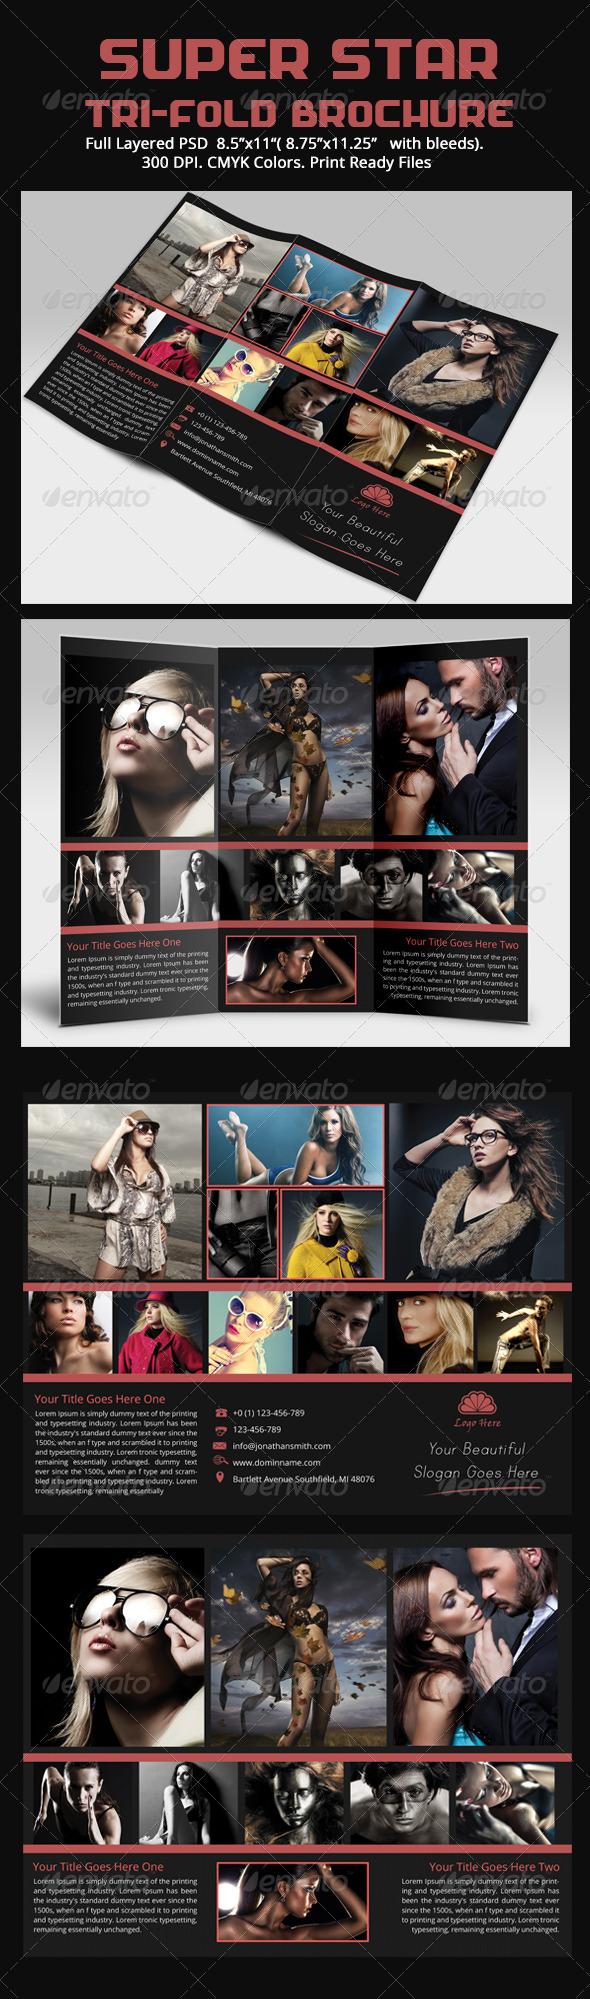 Super Star Tri-Fold Brochure Templates - Brochures Print Templates